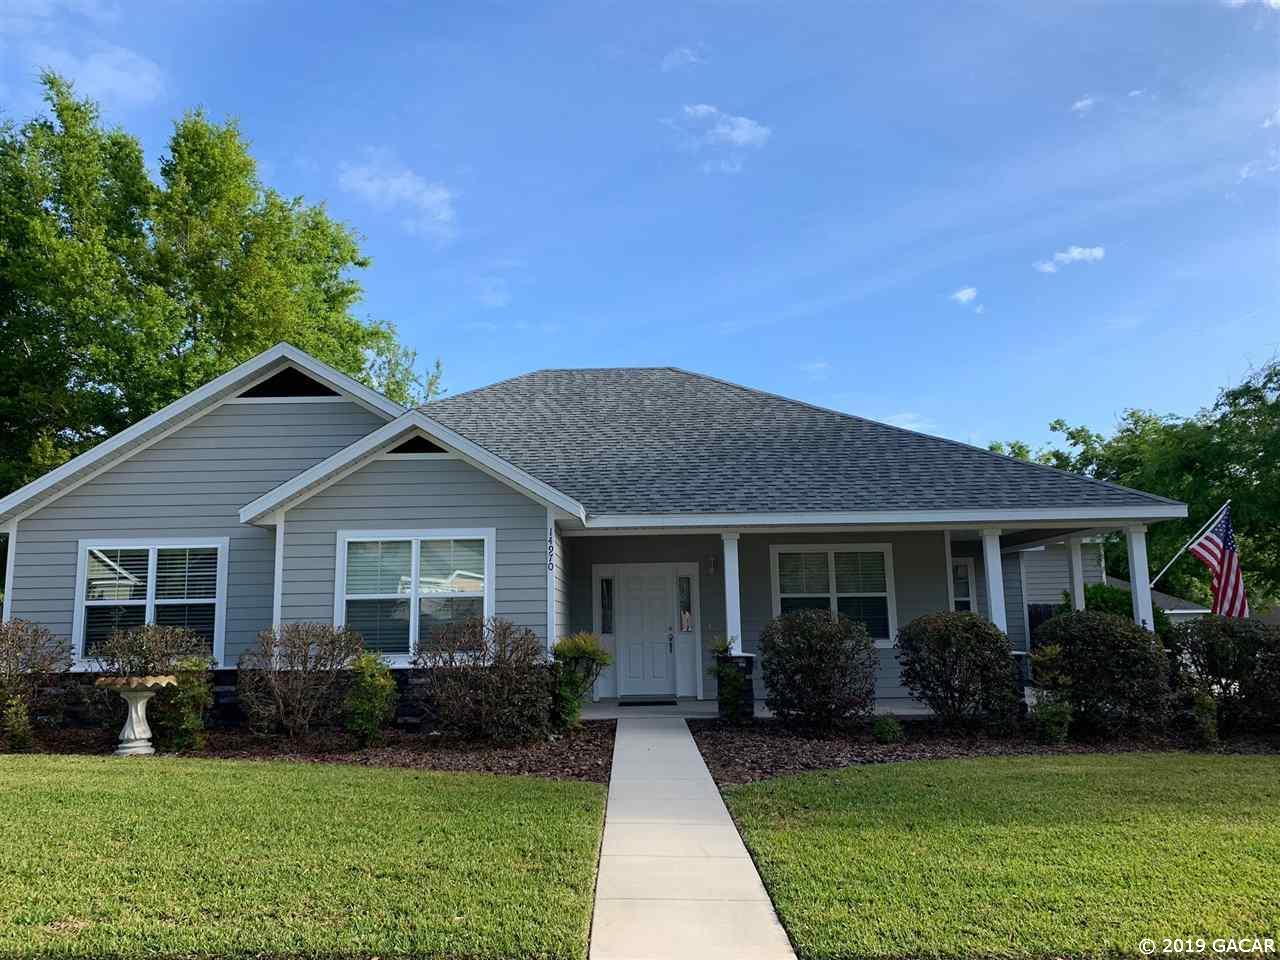 14970 NW 149th Place, Alachua, Florida